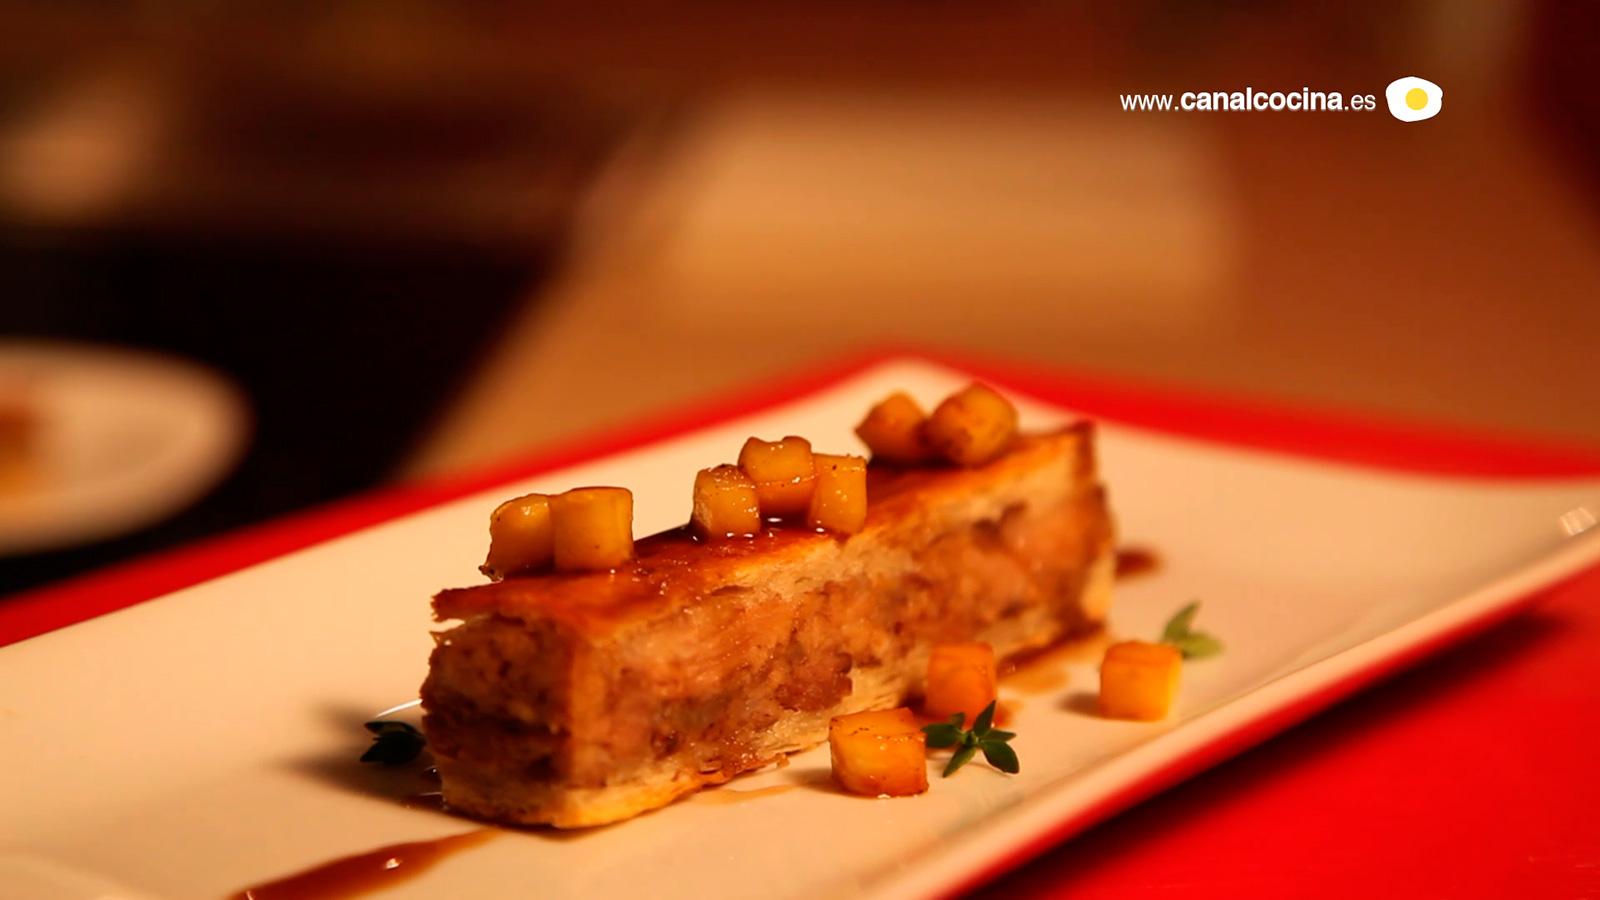 Pincho la empapada amaya bezunartea video receta for Canal cocina tapas